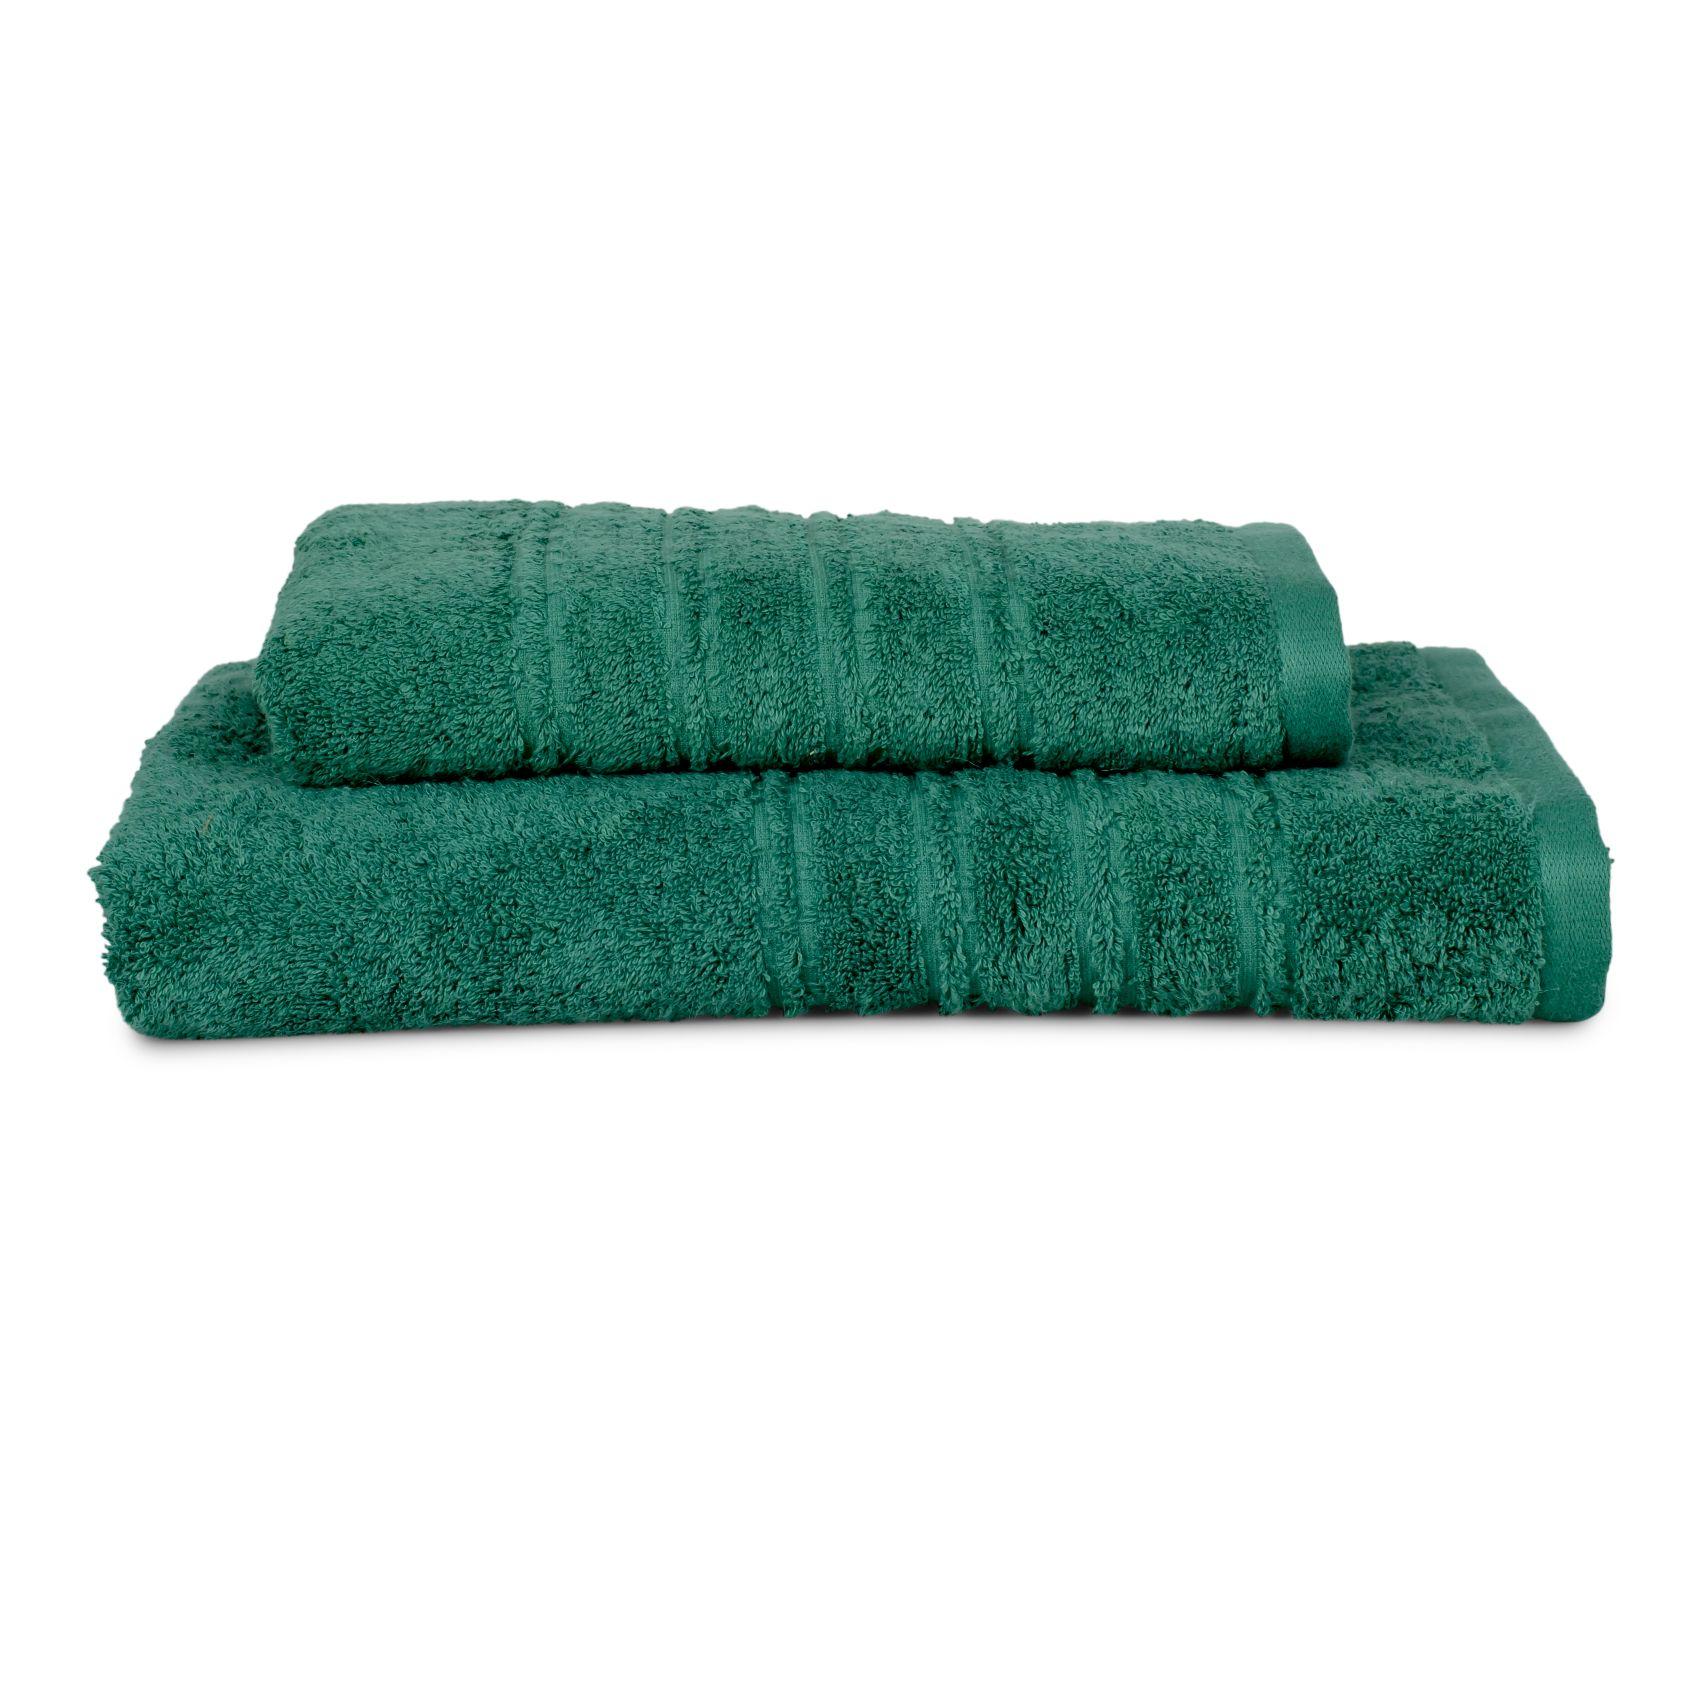 Nordstrand Nettle håndklæde, 70x140 cm, grøn